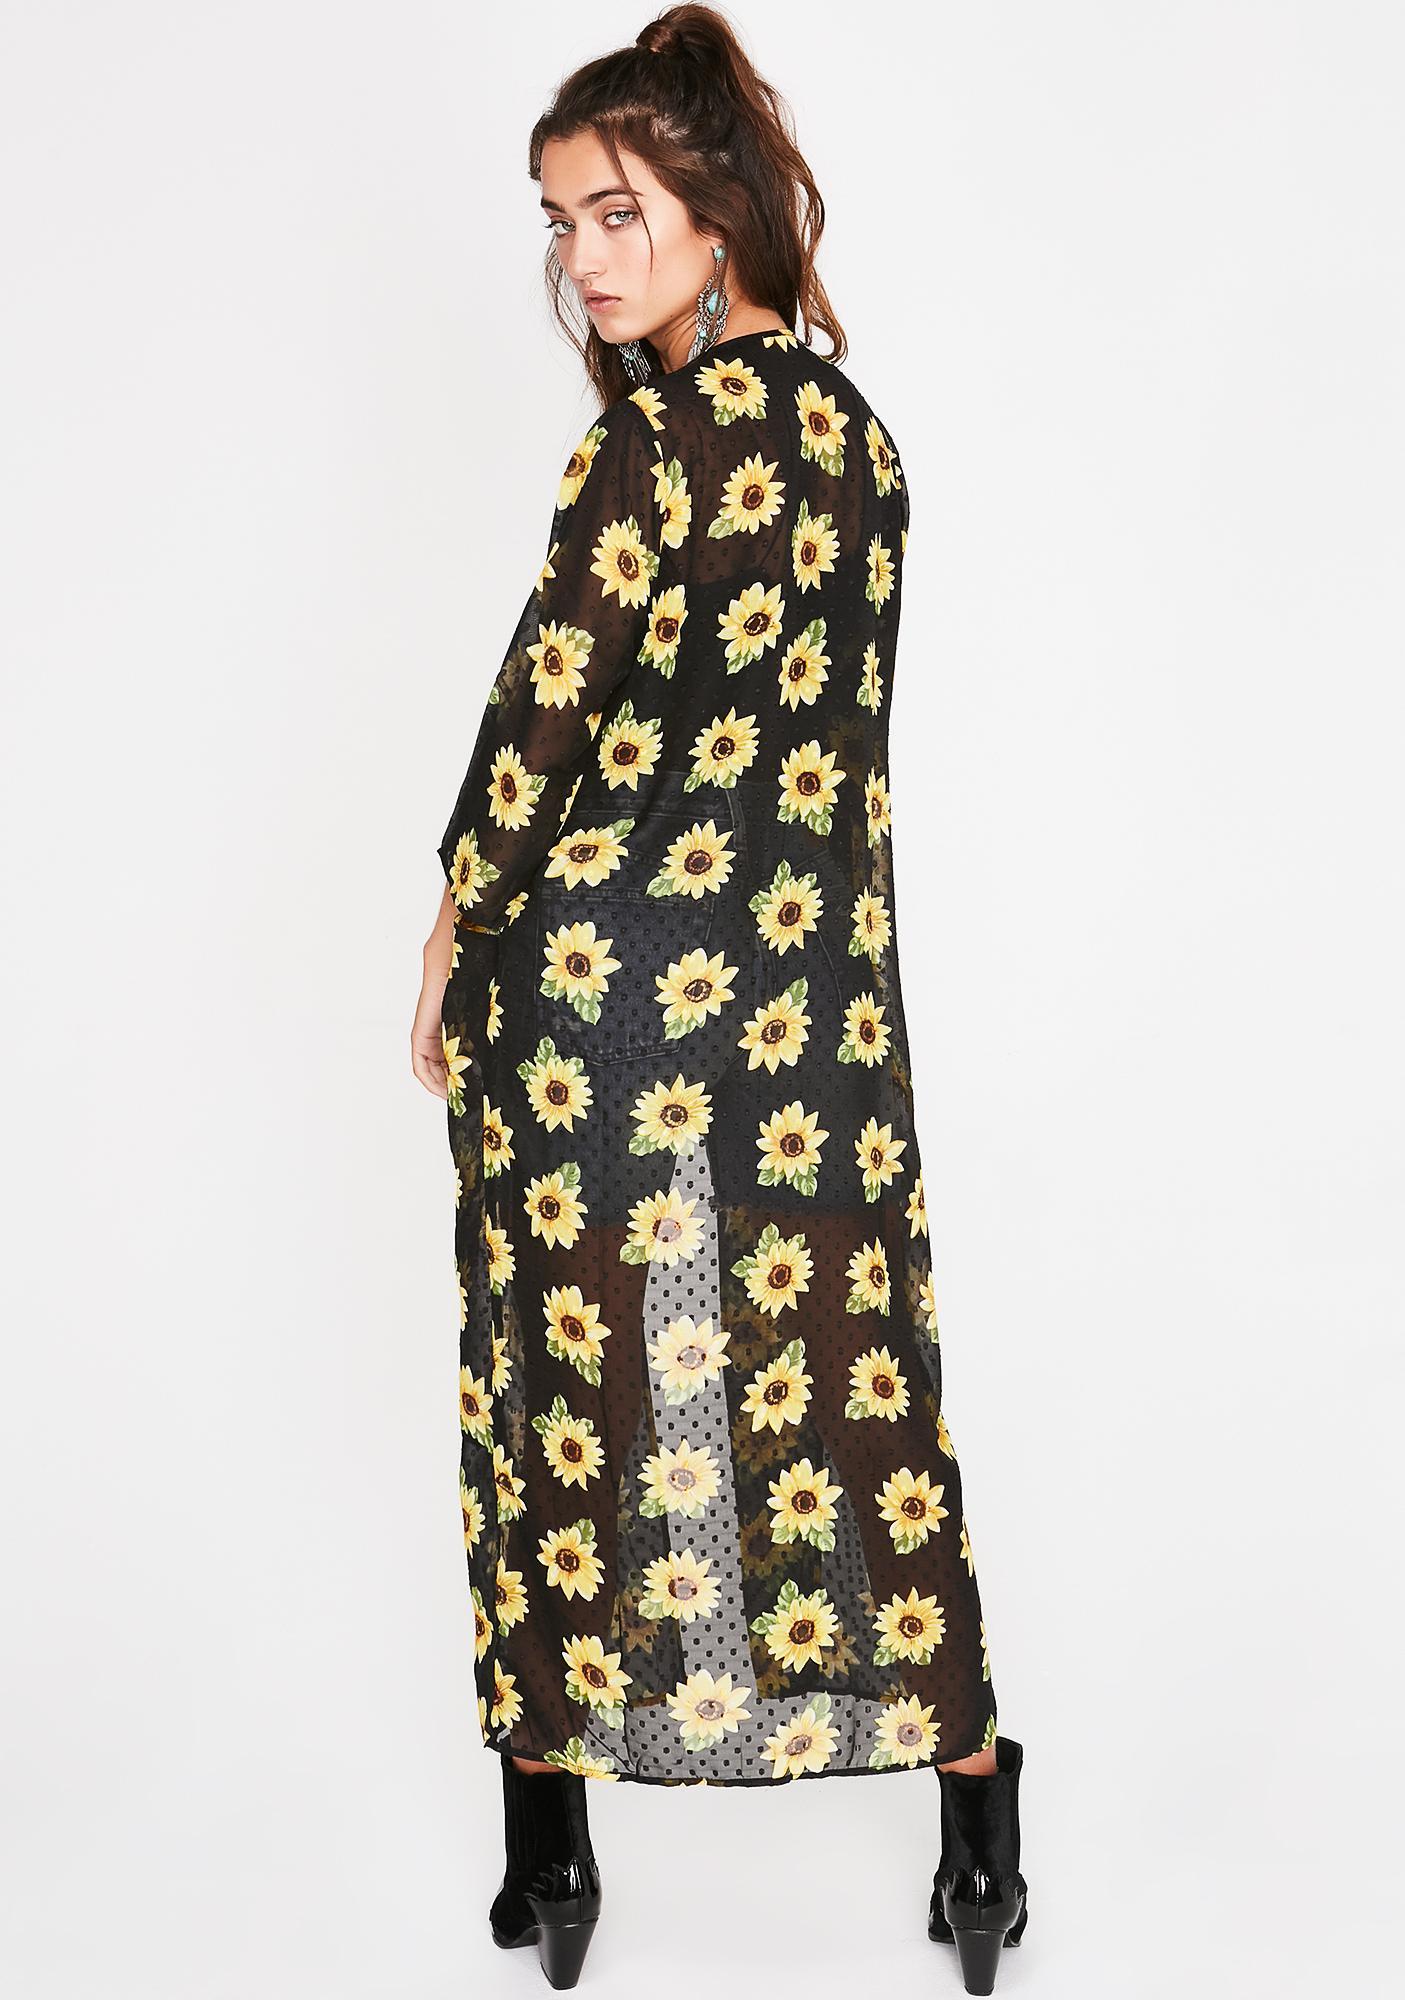 Sassy Sunflower Kimono